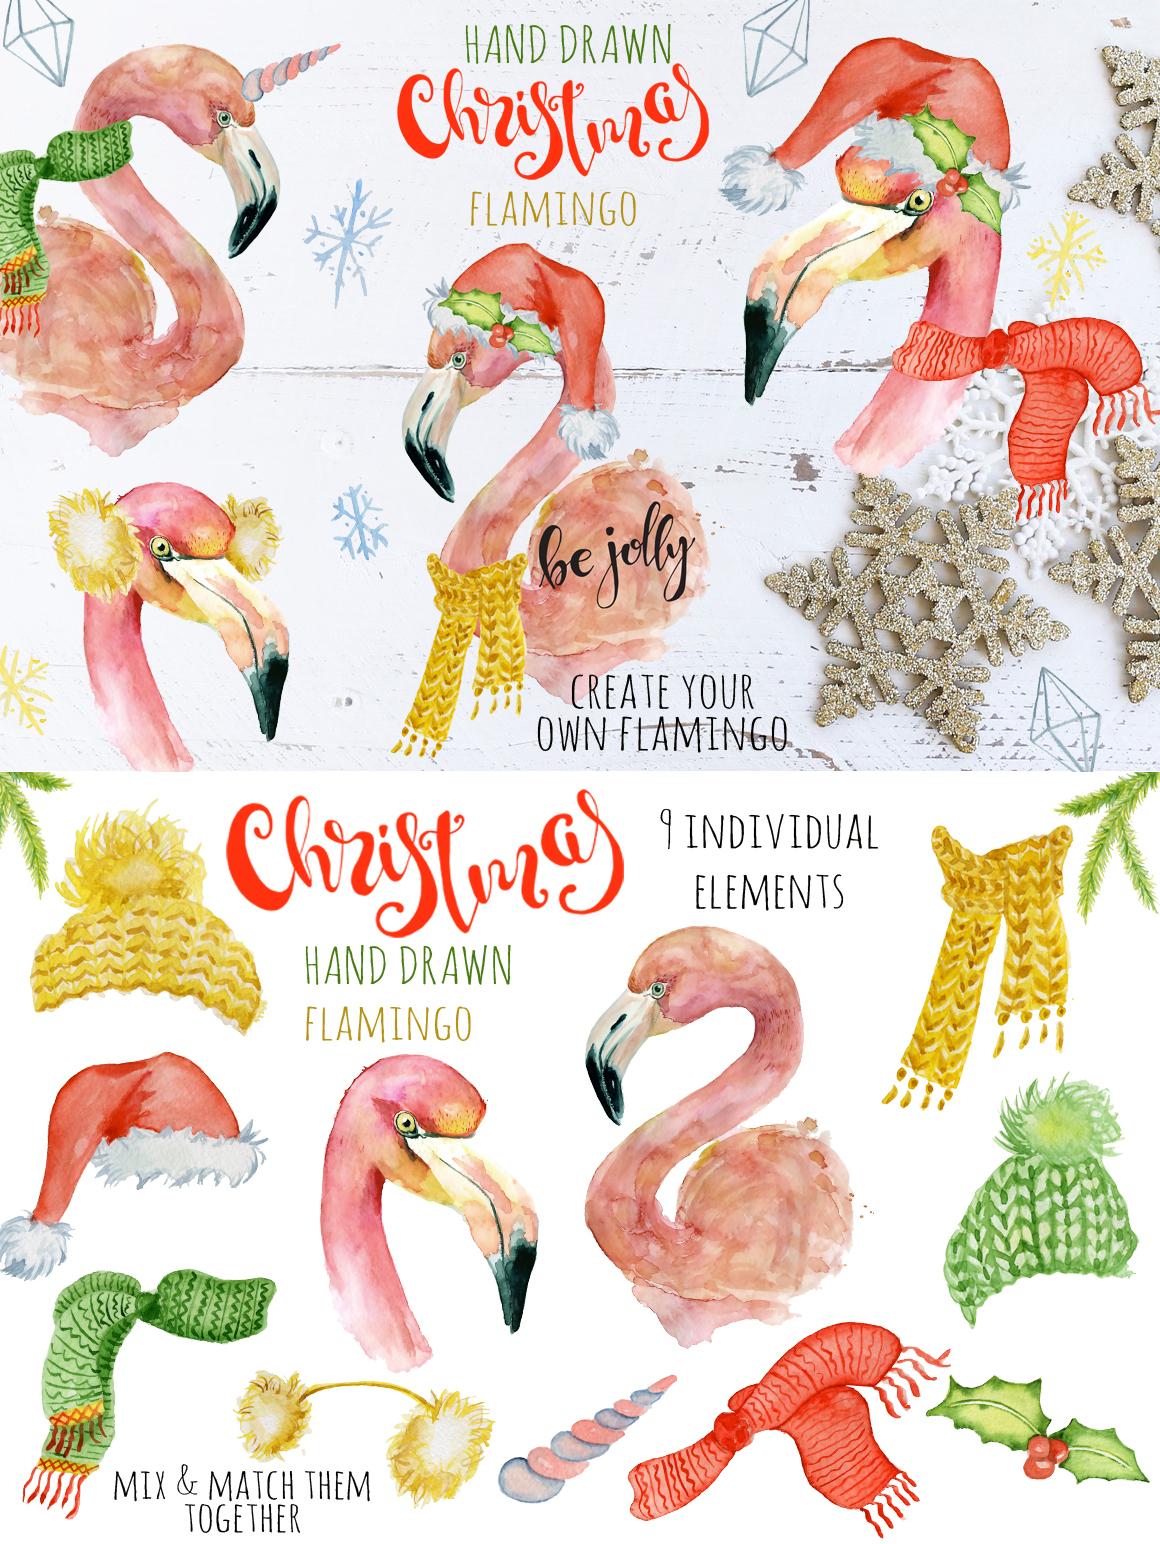 Winter Wonderland Clipart: 14 Christmas Watercolor Clipart Bundles in 1 - $28 - 12 Flamingo